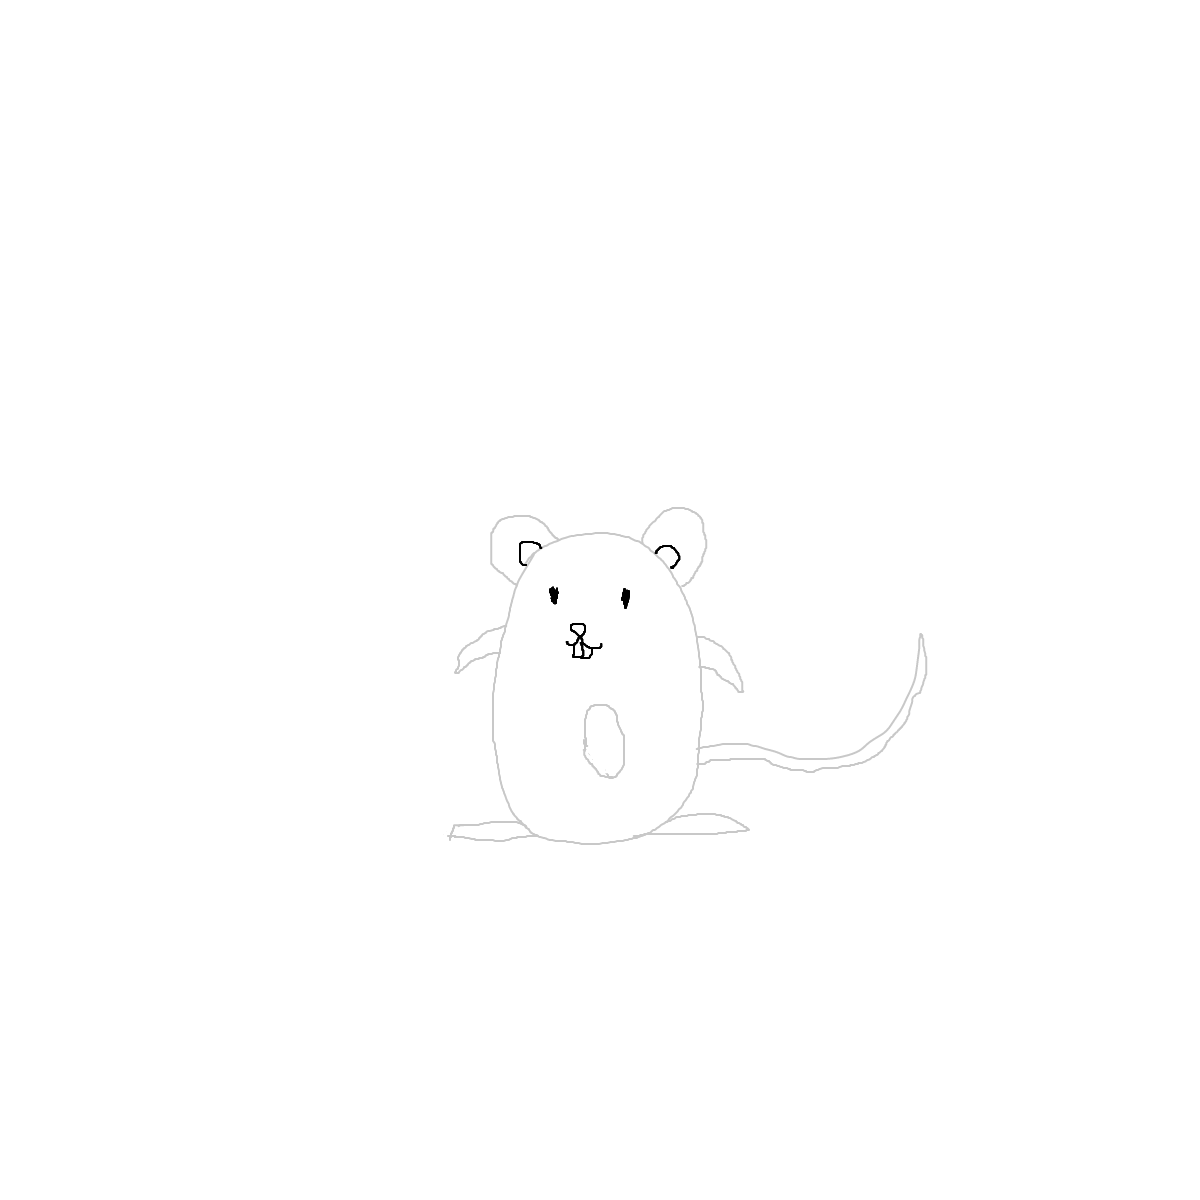 BAAAM drawing#16951 lat:51.2066802978515600lng: 3.2593445777893066